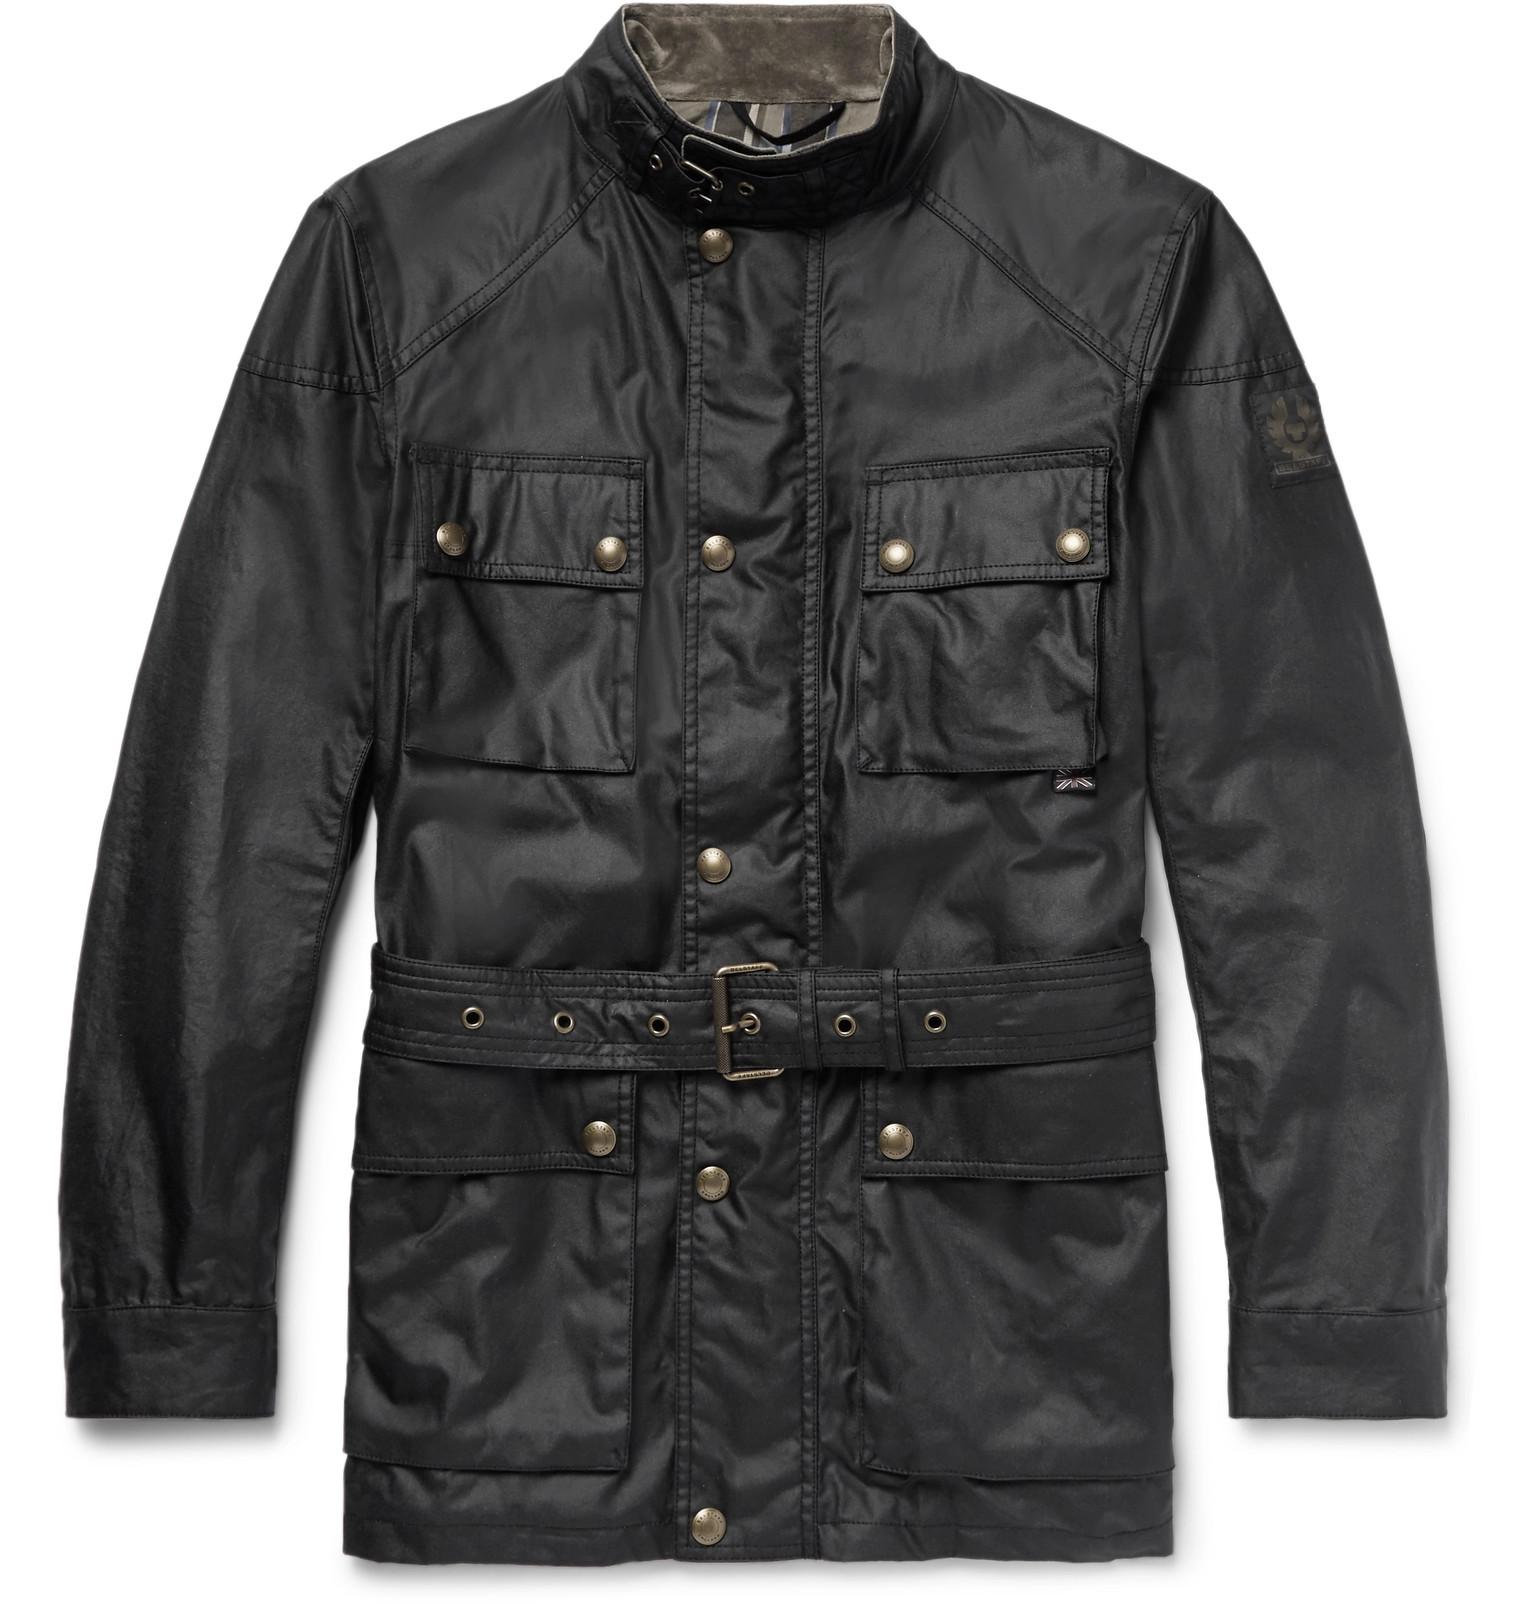 3c9cb94937 Belstaff - Trialmaster Waxed-Cotton Jacket